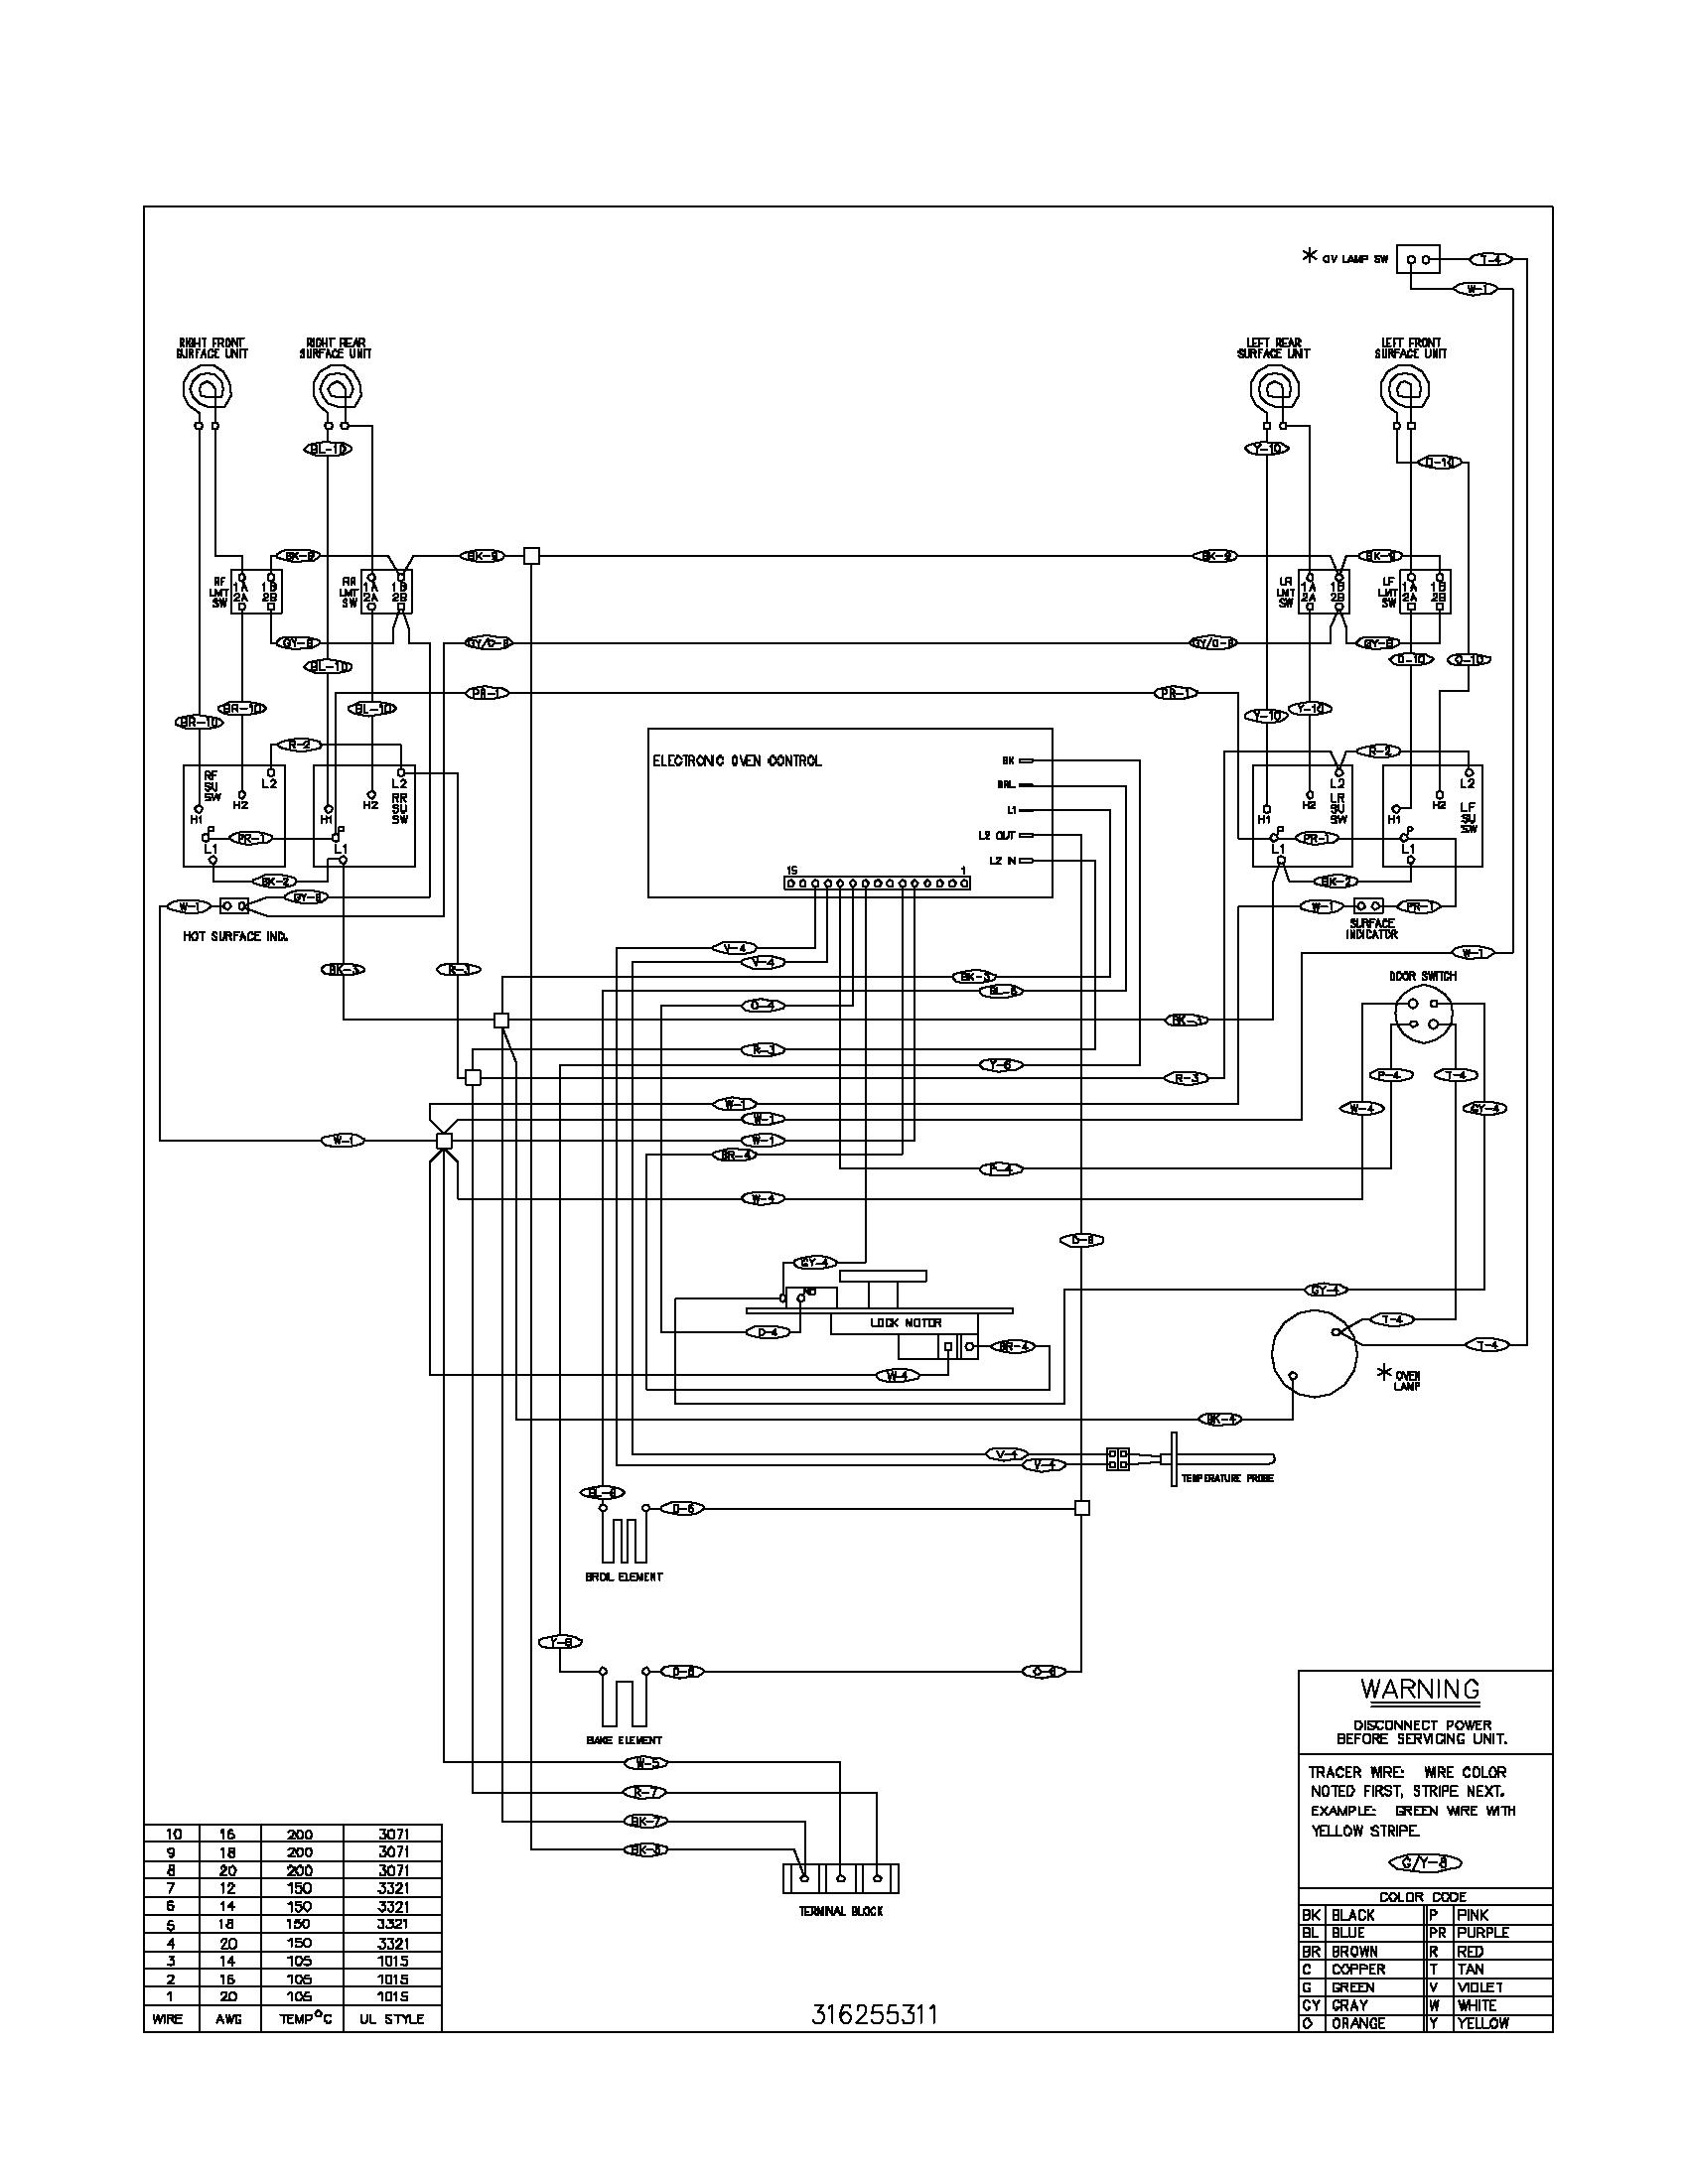 Vulcan Oven Wiring Diagram - Wiring Diagrams Schematics on vulcan 900 radio, vulcan 1500 wiring diagram, vulcan 1600 wiring diagram, vulcan 900 turn signals, vulcan 900 exhaust, vulcan 900 engine, vulcan 900 battery, vulcan 900 relay, vulcan 900 ecu, vulcan 900 steering, vulcan oven wiring diagram, vulcan 900 air cleaner, vulcan 900 frame, vulcan 750 wiring diagram, vulcan 900 fuel injector, kawasaki vulcan 800 wiring diagram, vulcan 900 accessories, vulcan nomad wiring diagram, vulcan 900 headlight, vulcan 900 wheels,